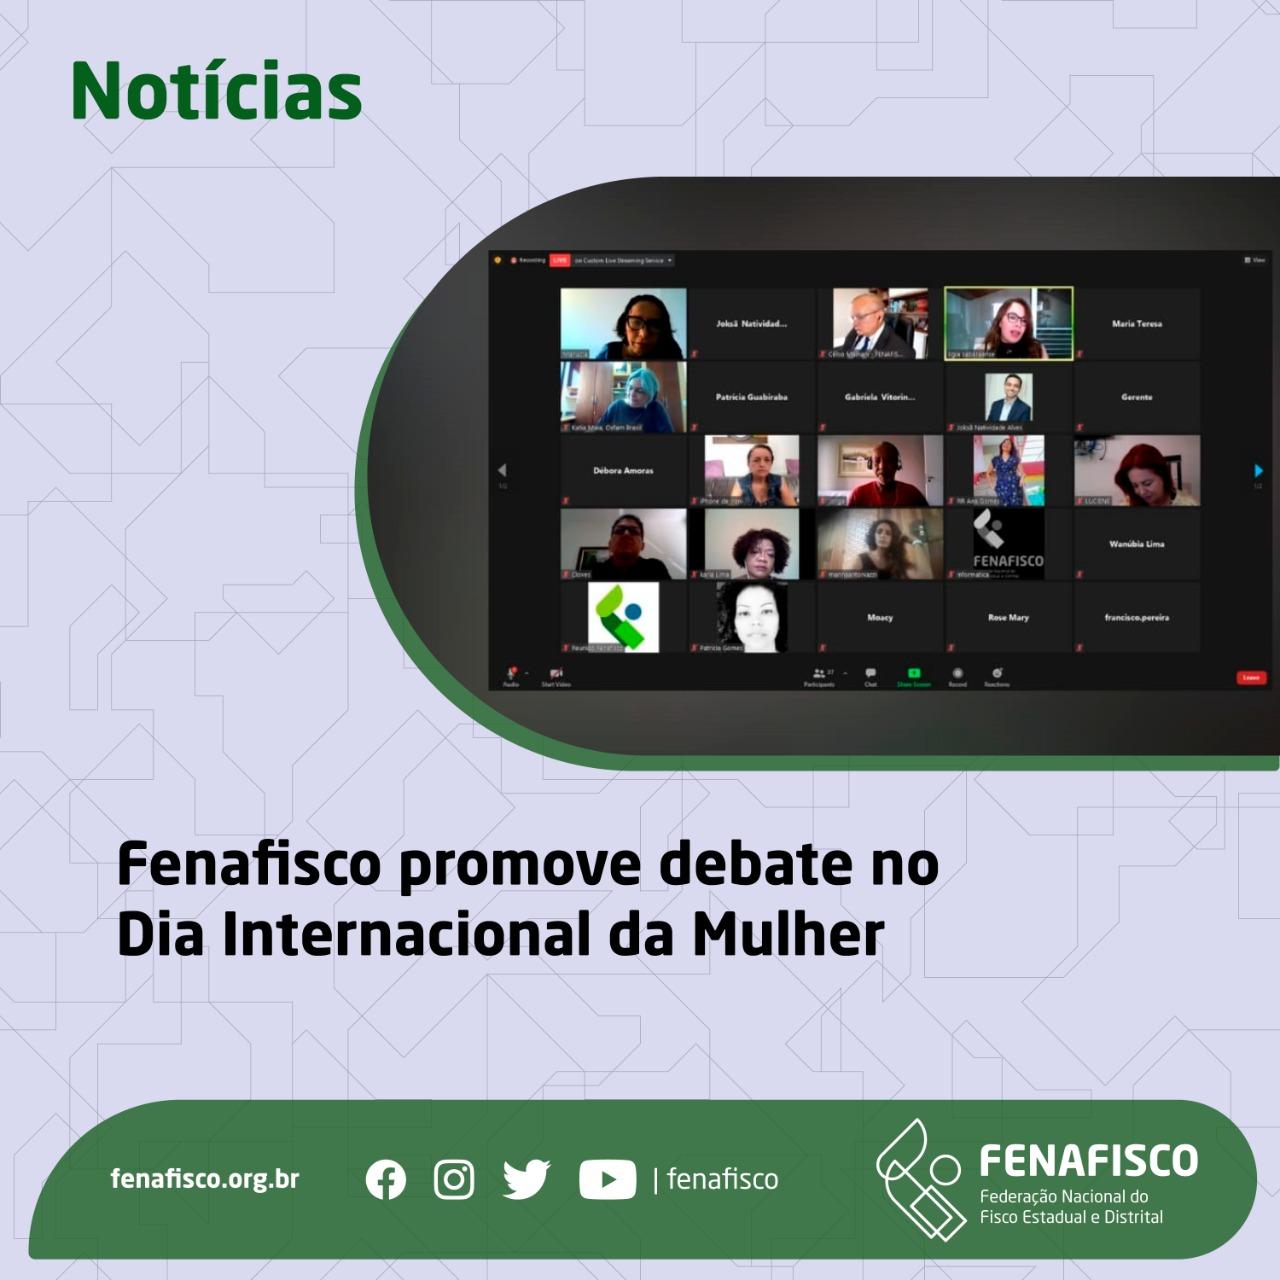 Fenafisco-Mulher.jpg